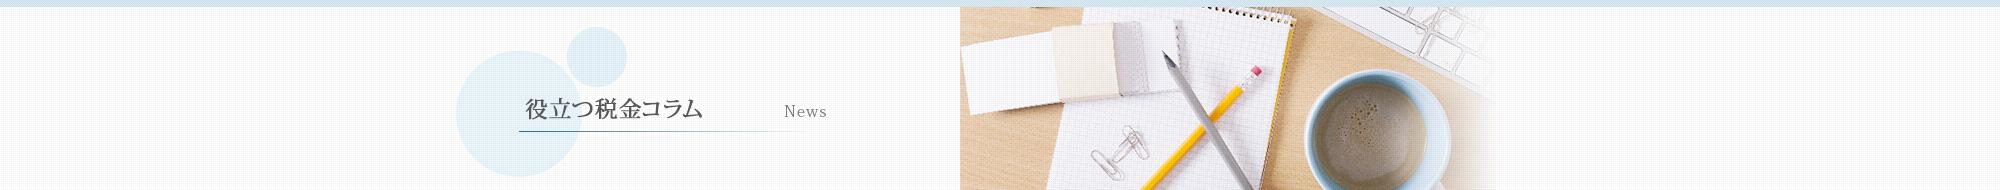 松原陽子の画像 p1_29